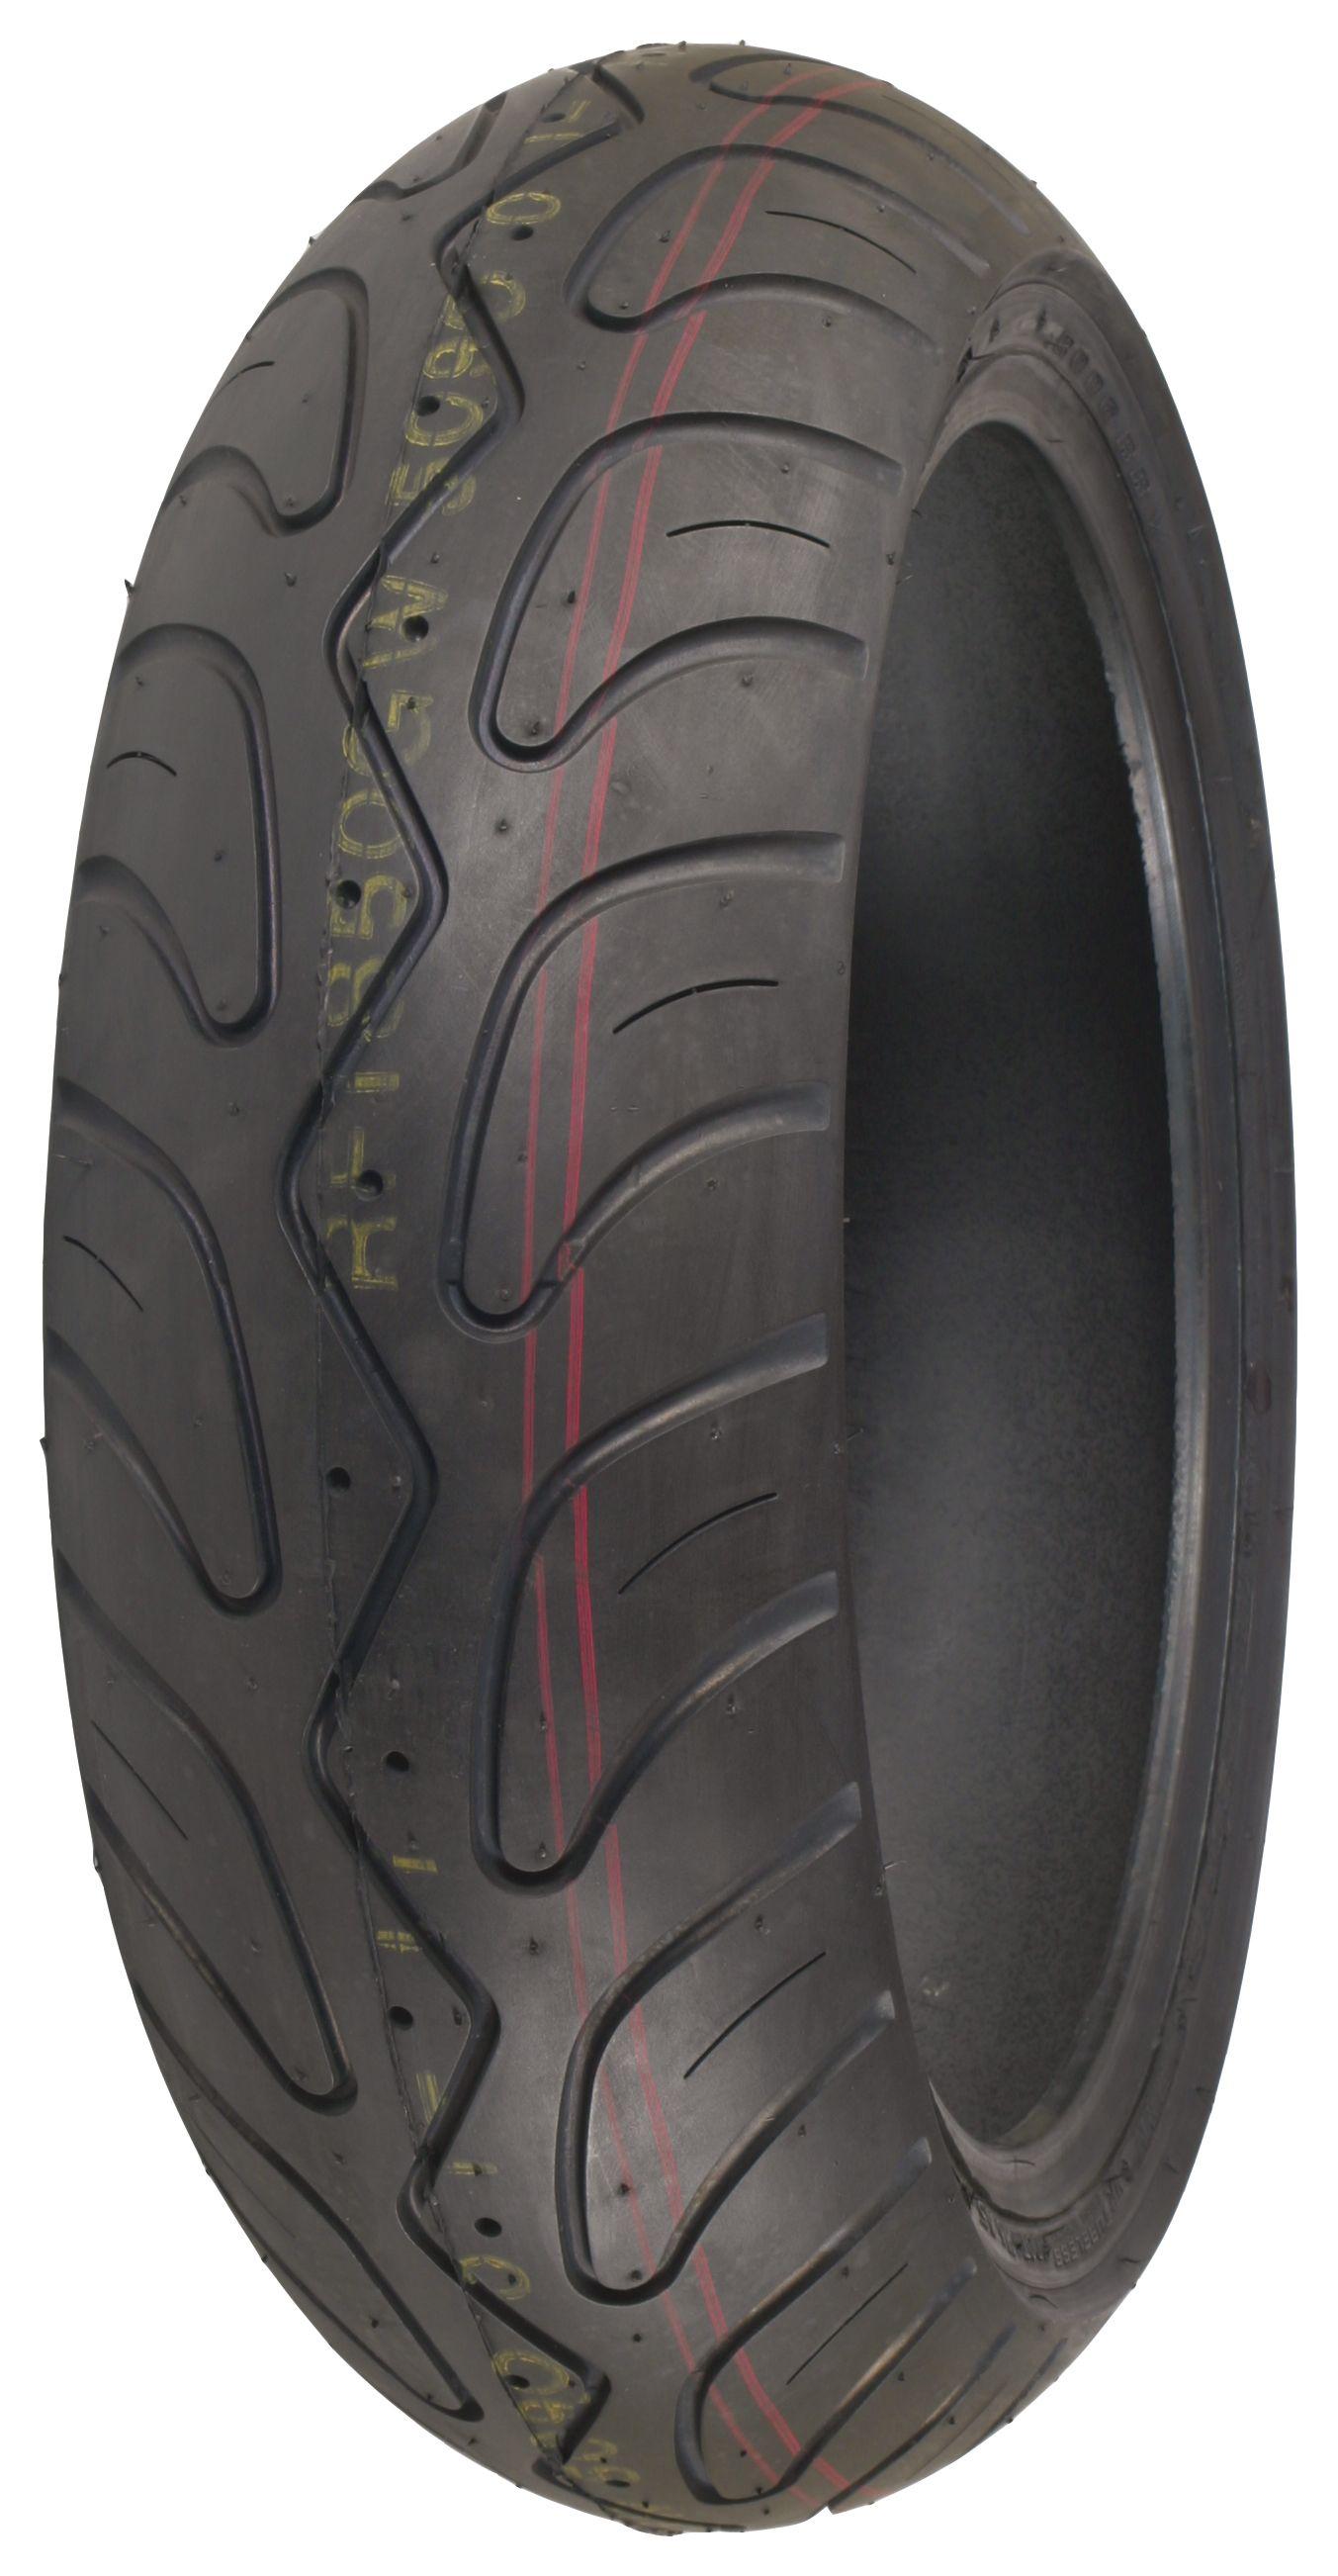 Snow Dirt Bike >> Shinko 006 Podium Rear Tires | 23% ($28.24) Off! - RevZilla